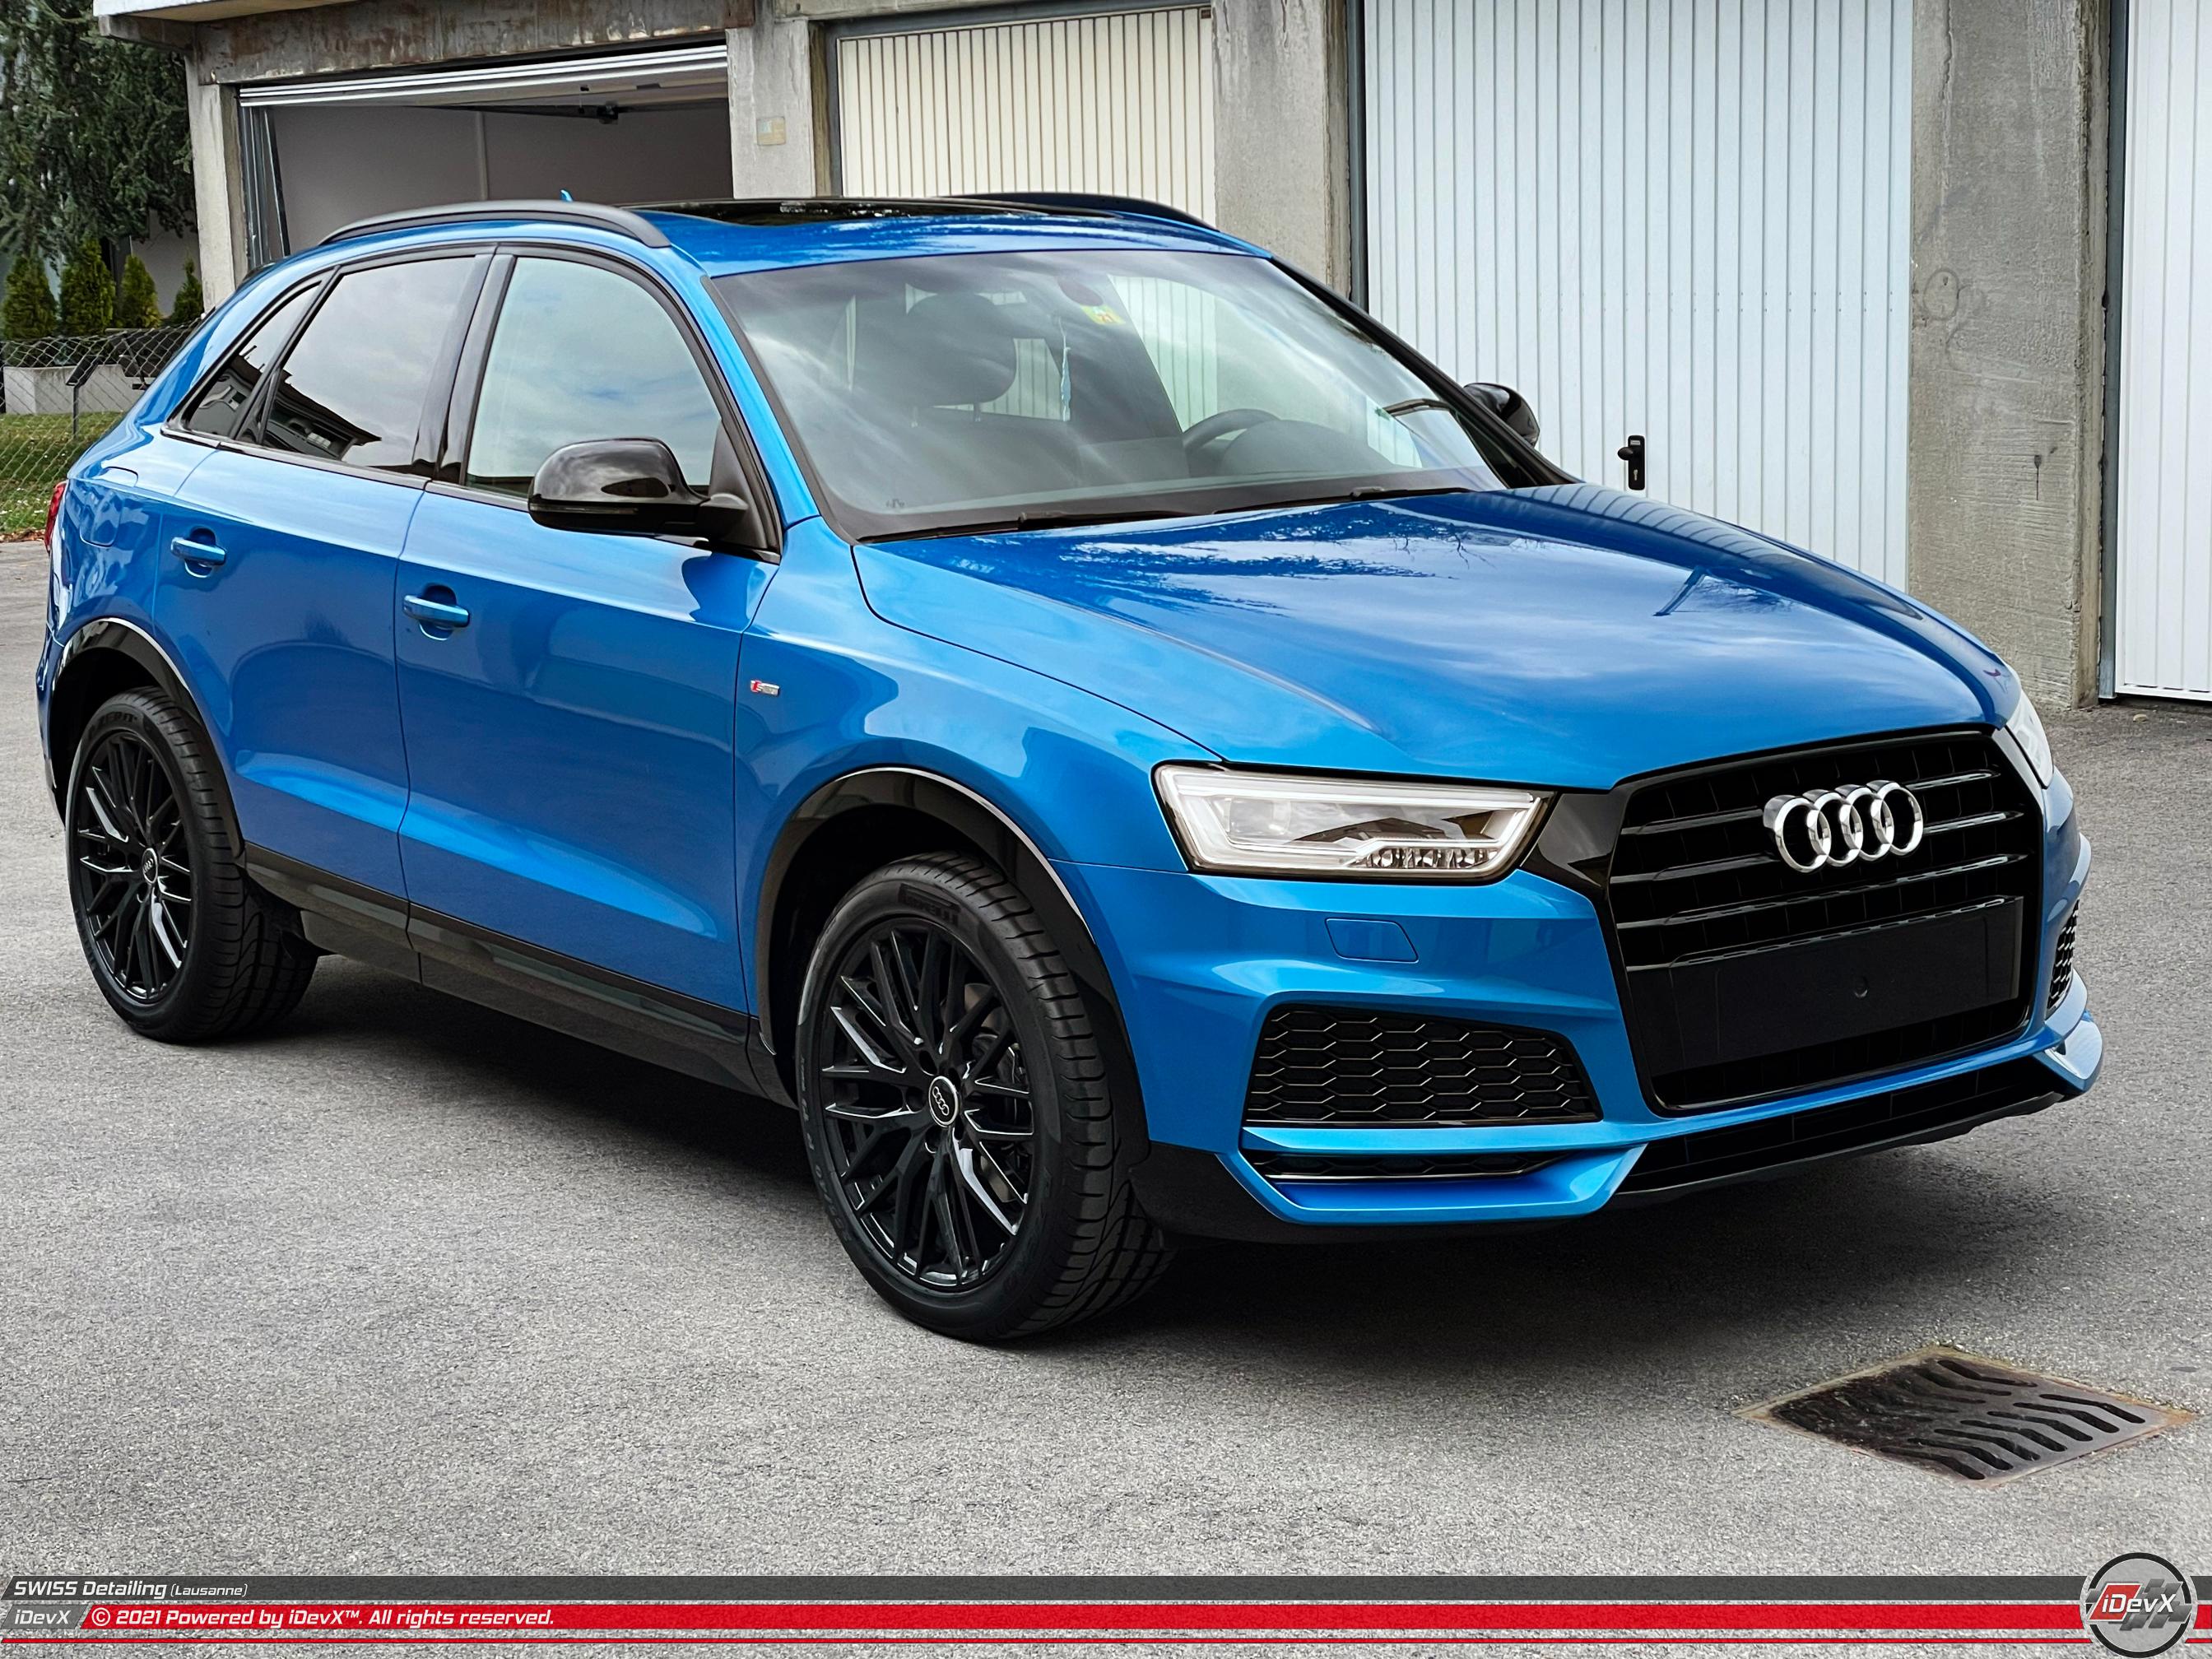 05.03.2021_Audi-Q3_iDevX_000.png